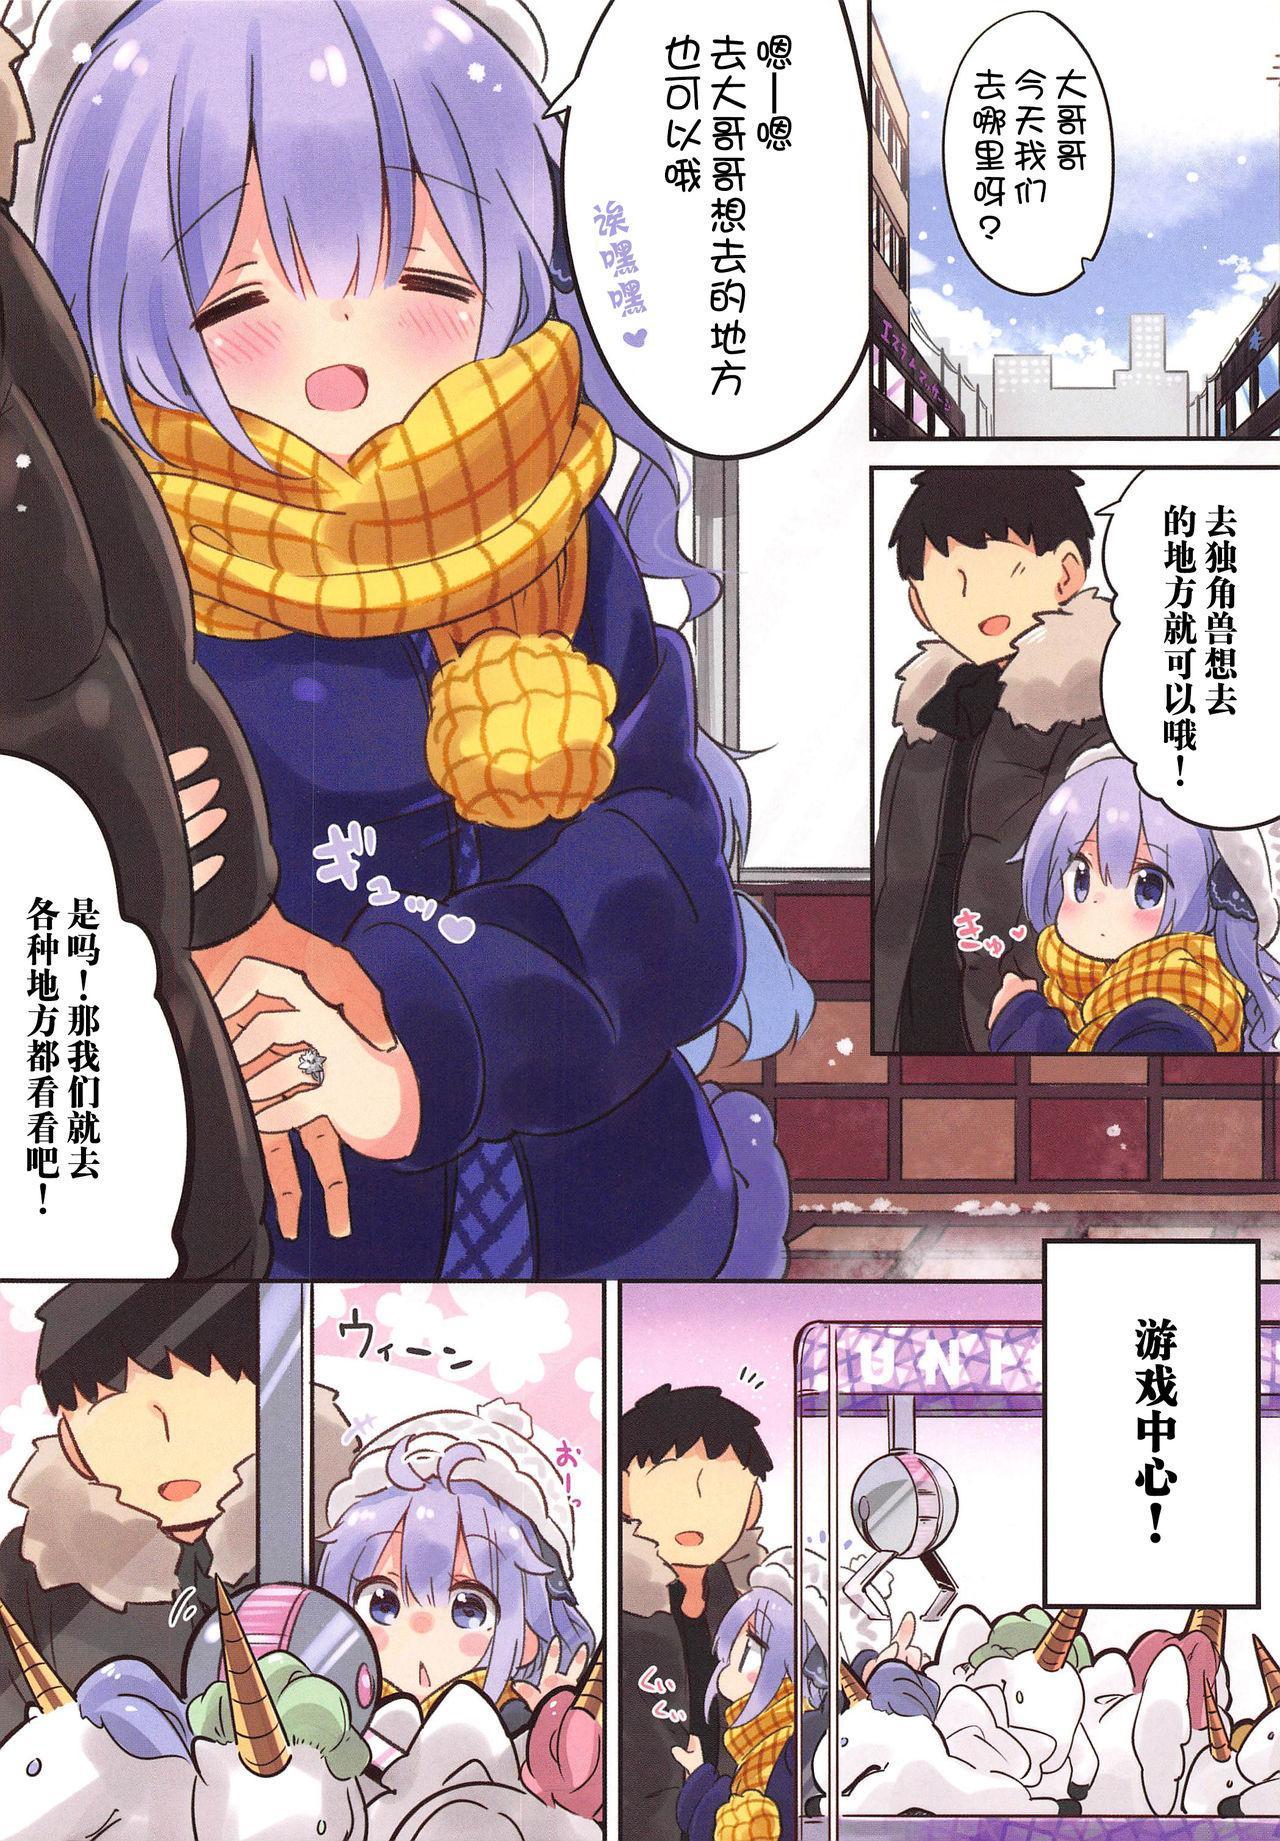 (COMIC1☆16) [Toto-taste (Suzuki Toto)] Papa wa (Onii-chan wa) Watasanai (Kantai Collection -KanColle-, Azur Lane) [Chinese] [钢华团汉化组] 2